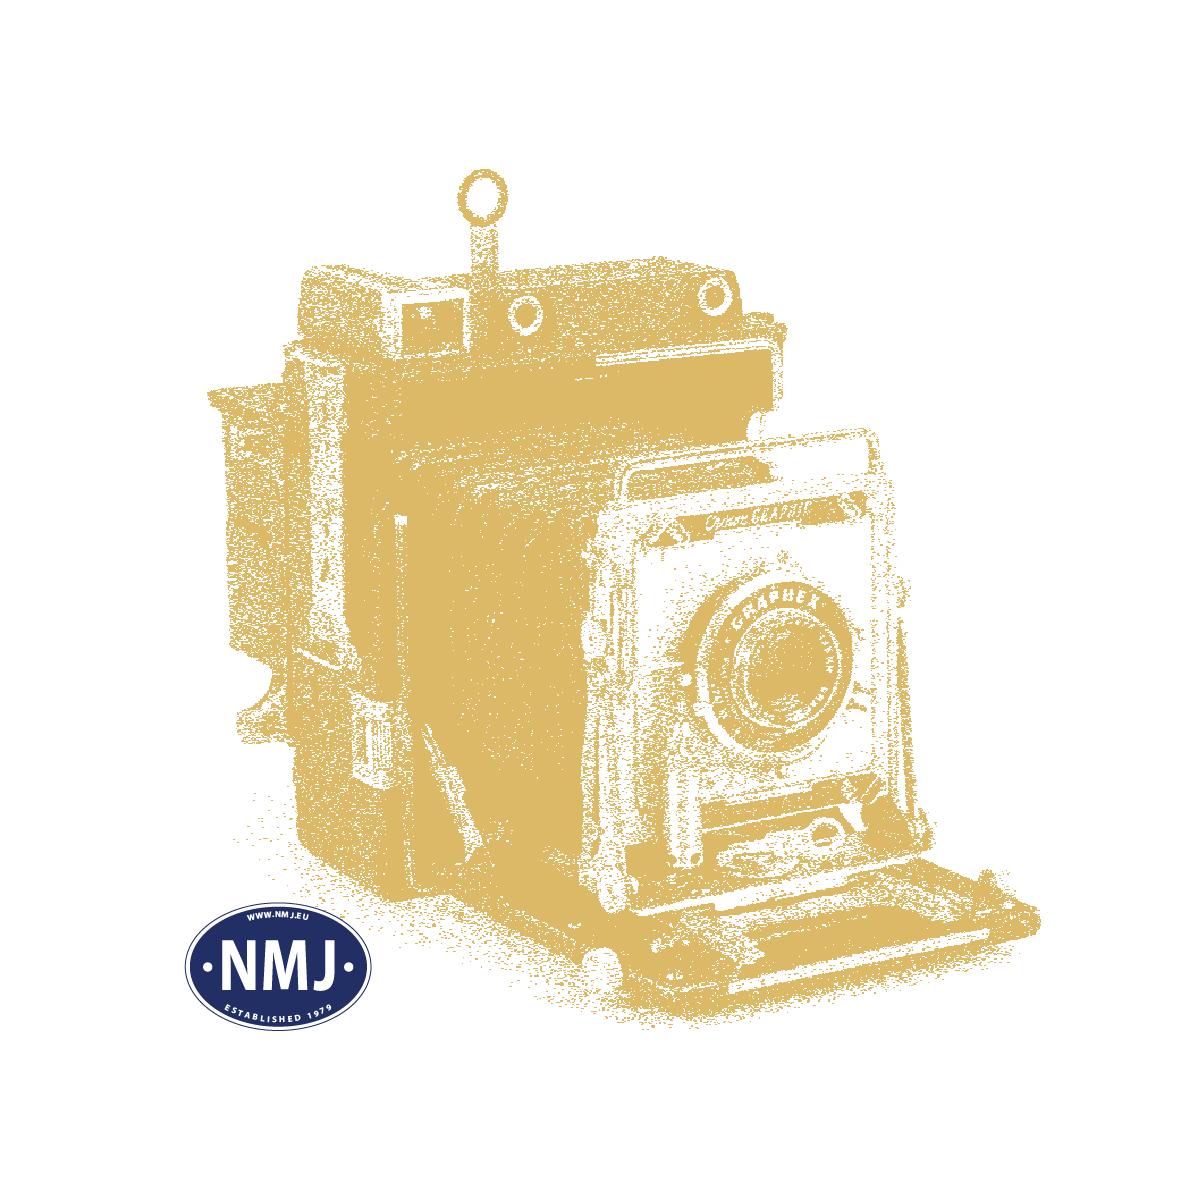 NMJT90304 - NMJ Topline CFL 1601 (1956-1971), DCC m/Sound